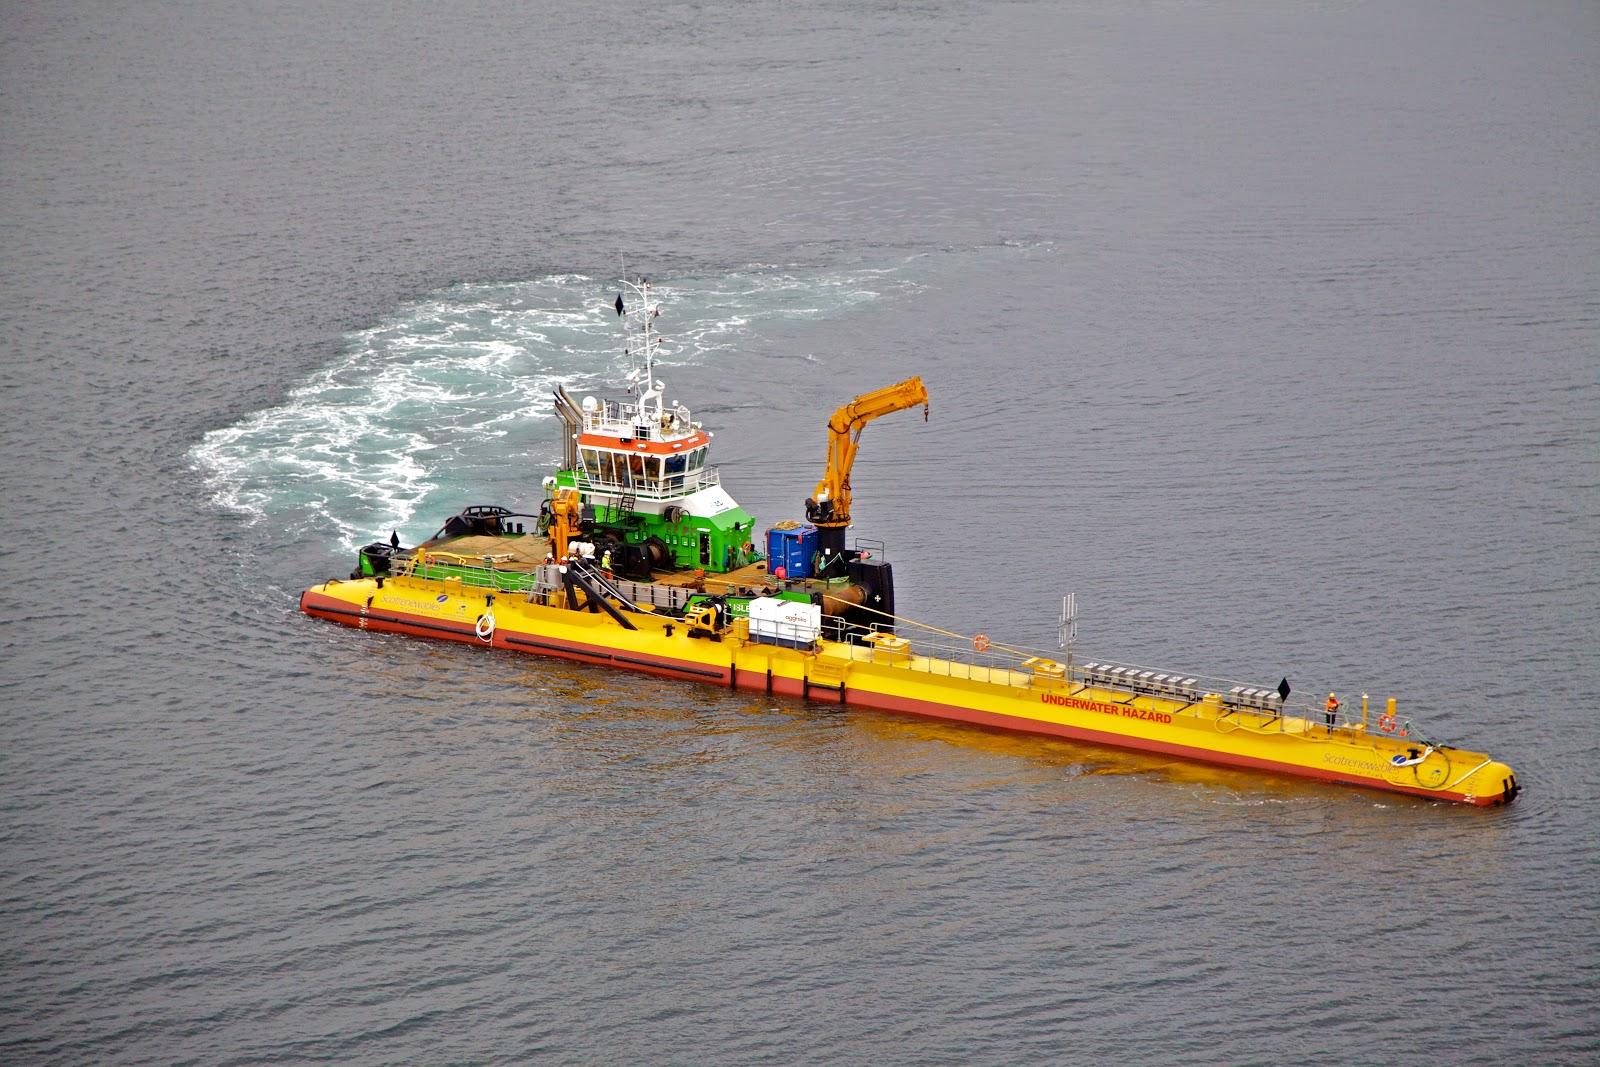 SR2000 being deployed at EMEC tidal test site